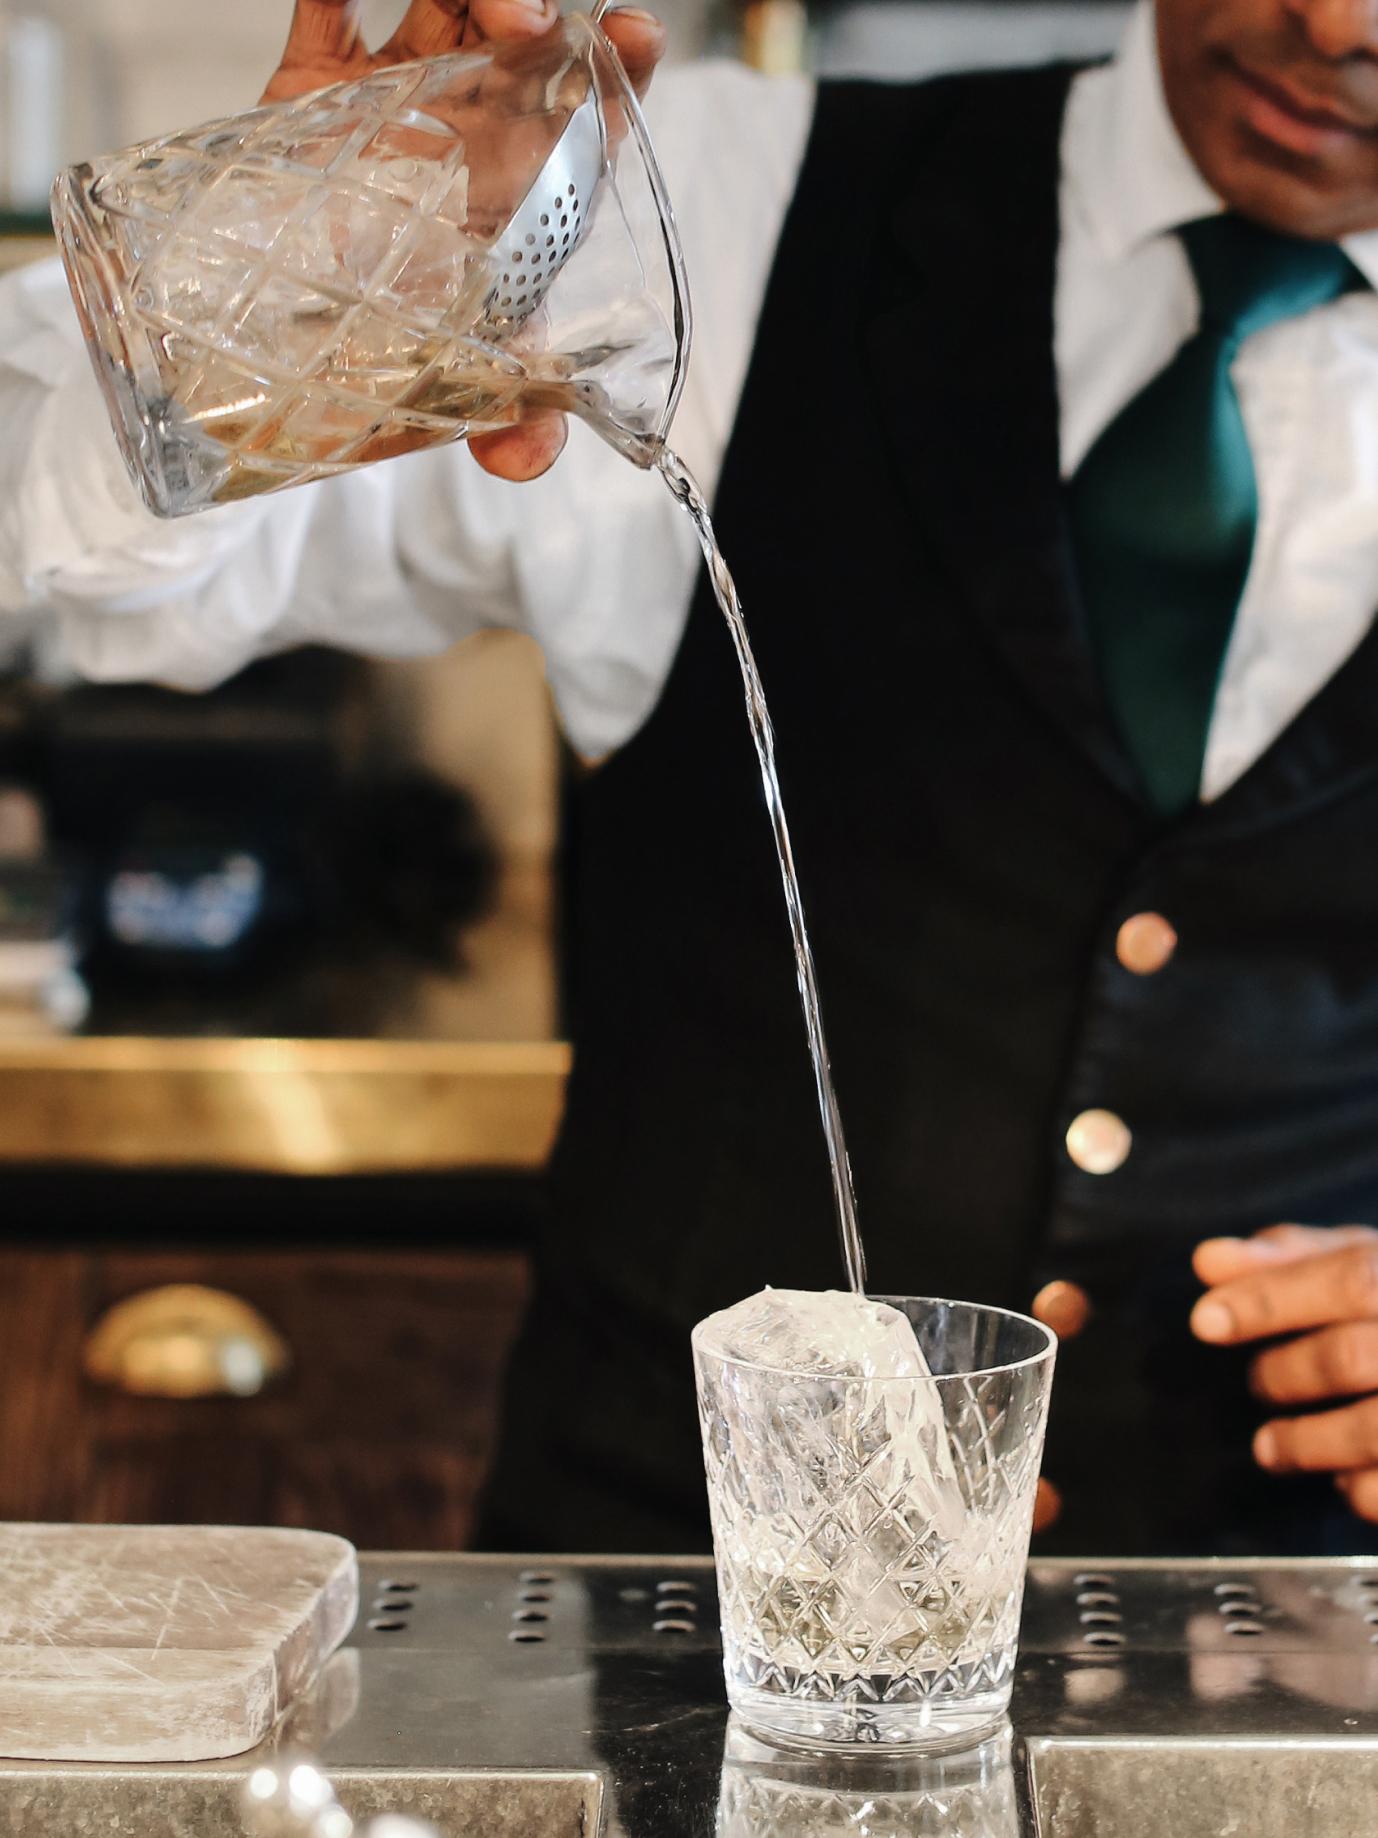 A barman pours liquid into a glass.